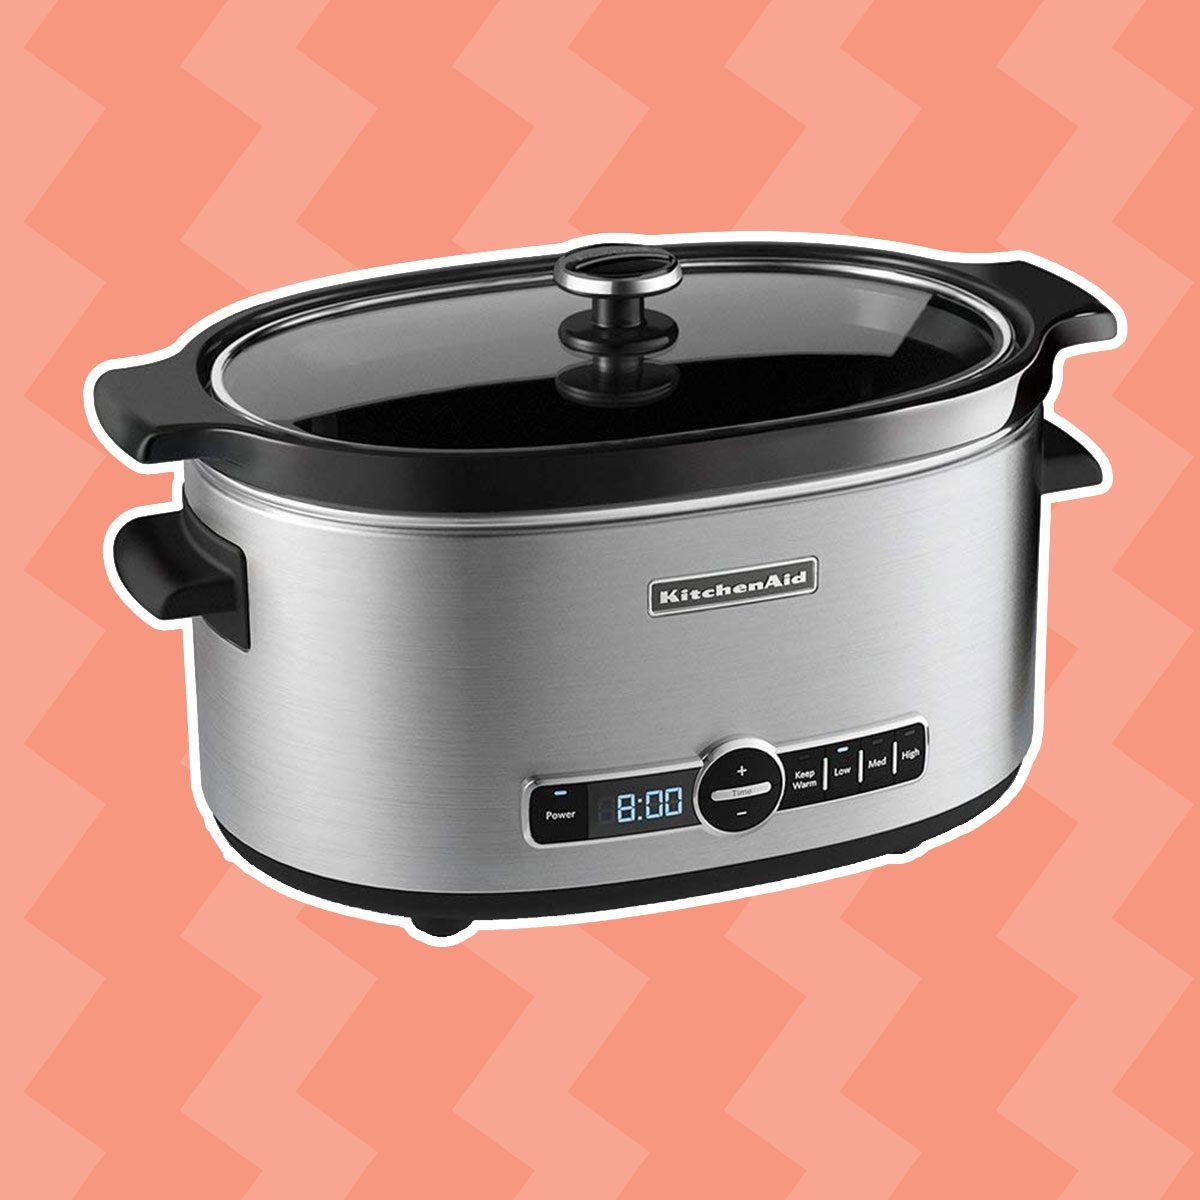 Kitchenaid 6 Qt Slow Cooker Amazon Kitchen Appliances Tips And Review